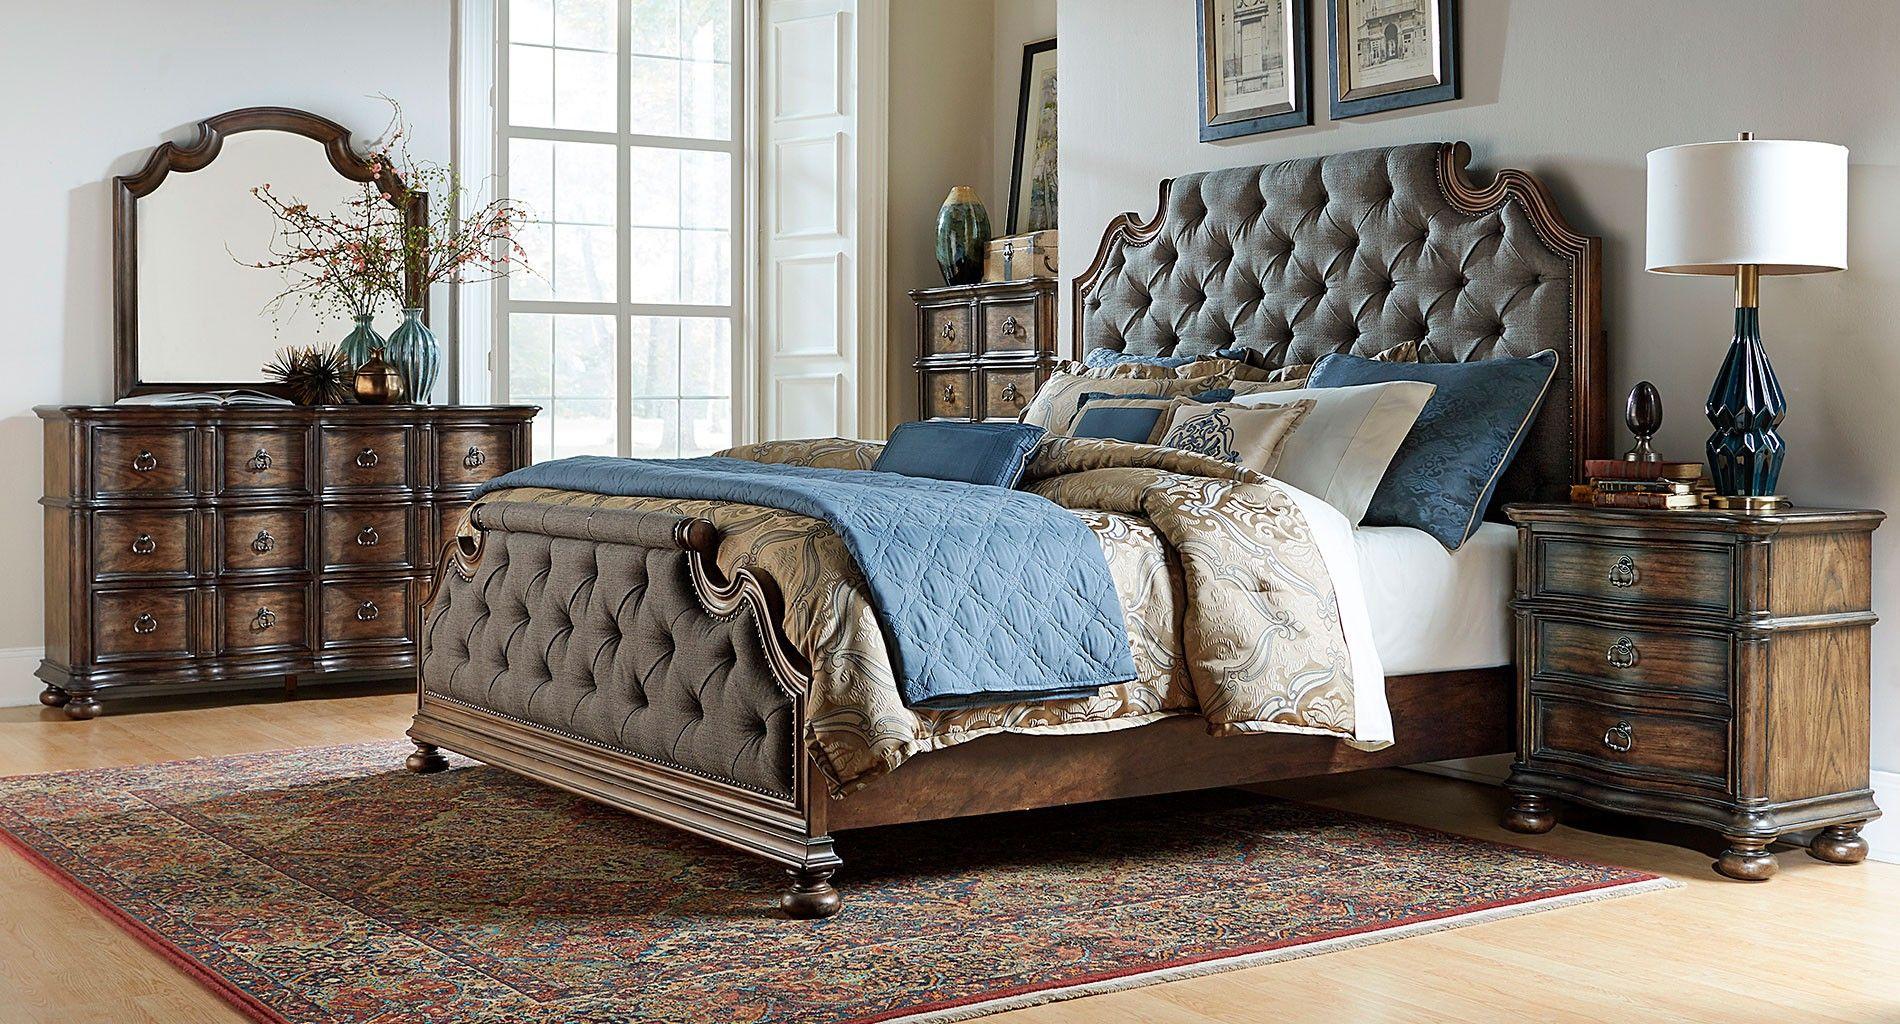 Tuscan valley upholstered bedroom set bedroom by furniturecart